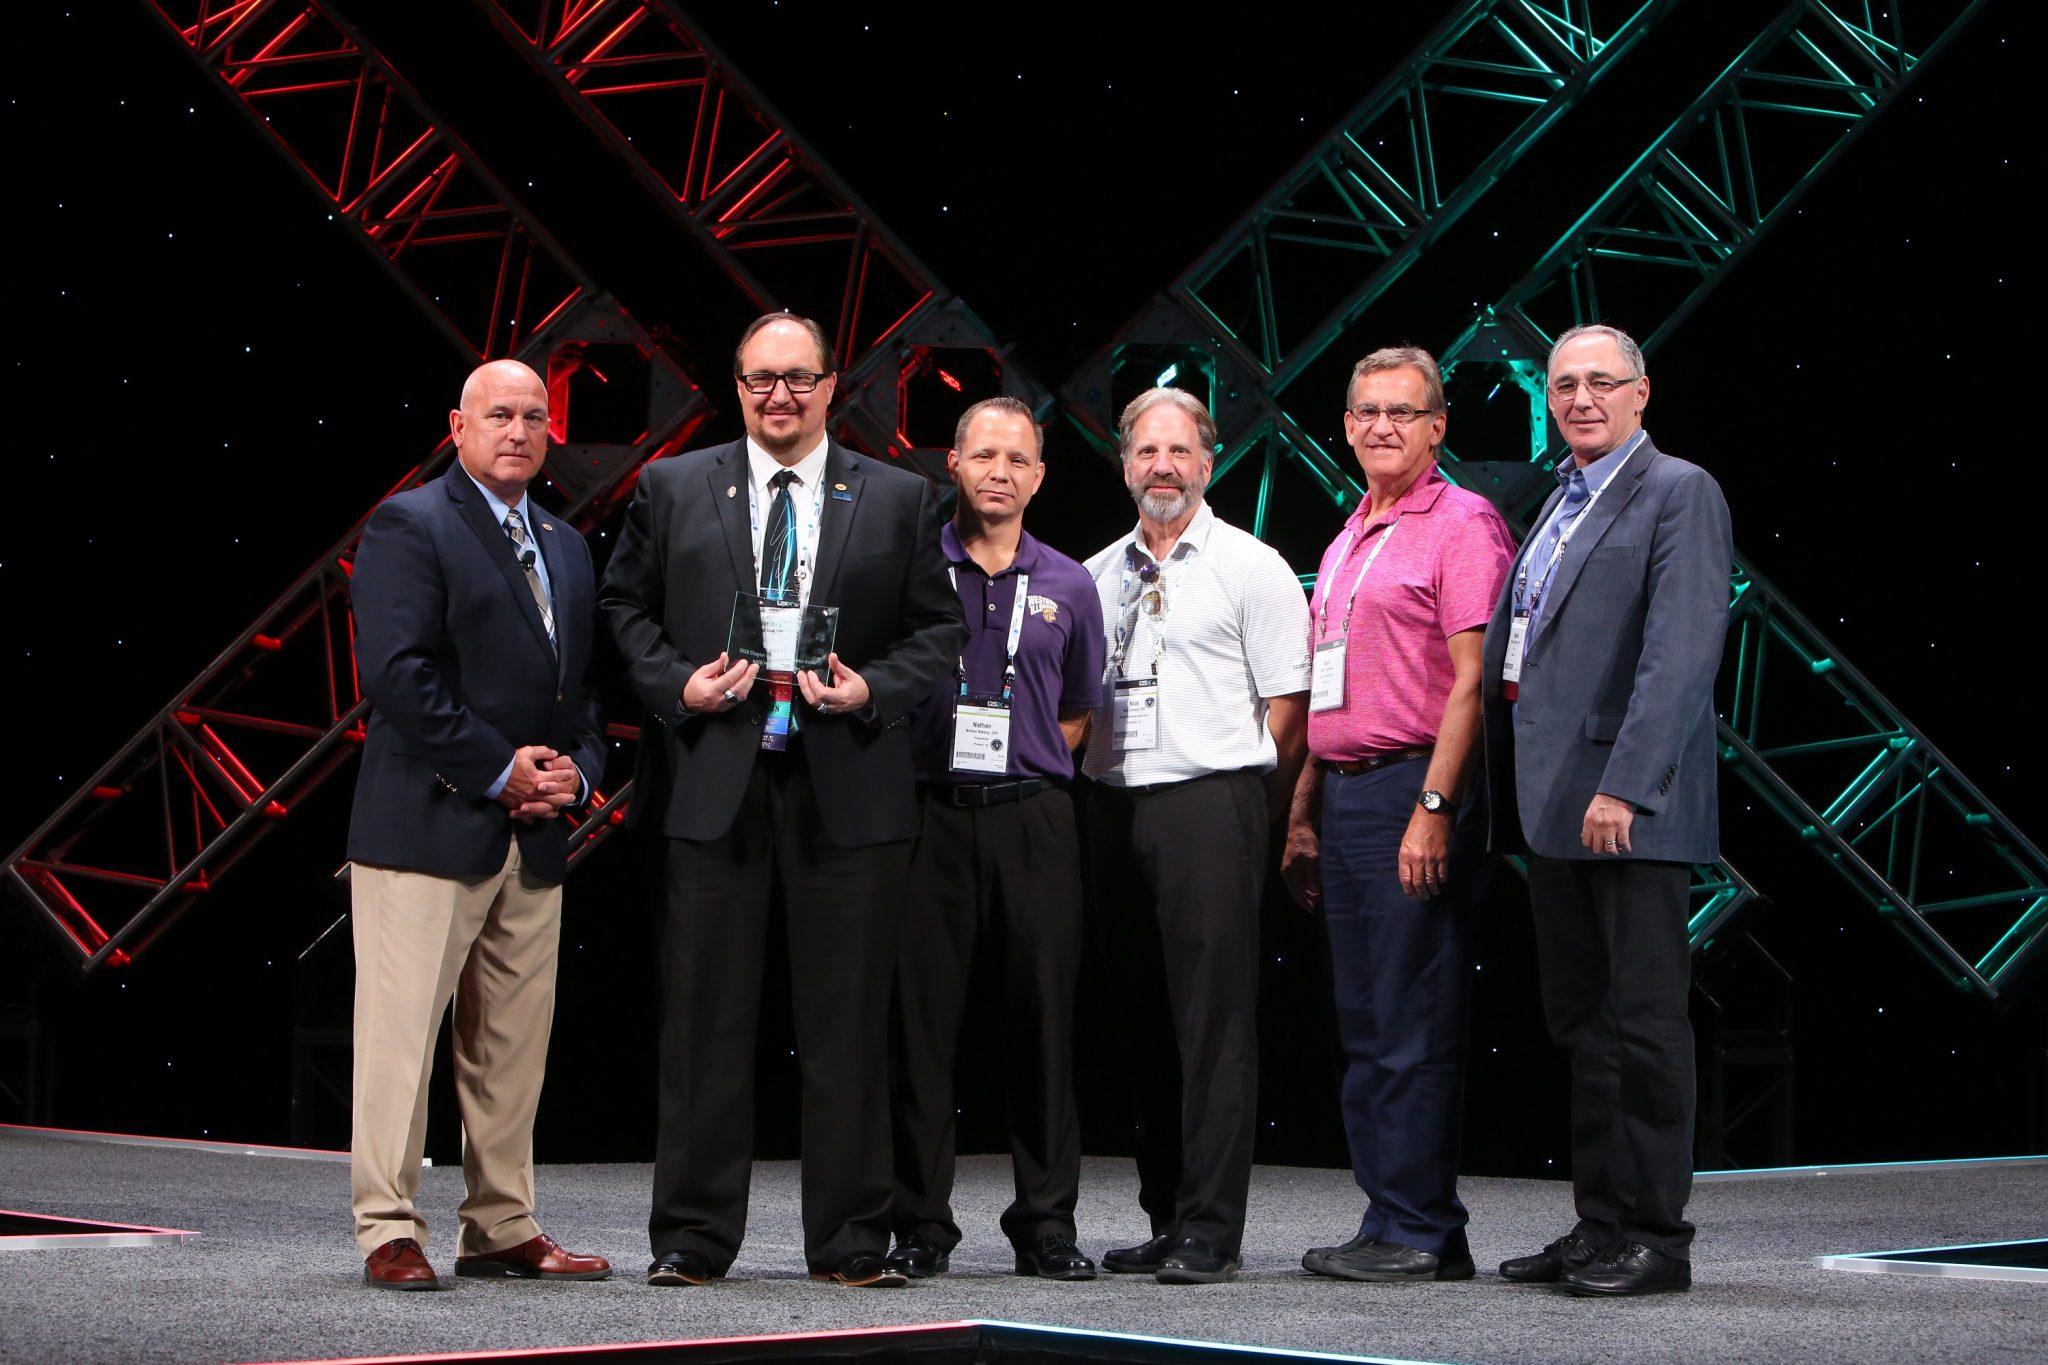 Award Group 6: Phoenix Chapter, 2018 Chapter Community Service Winner